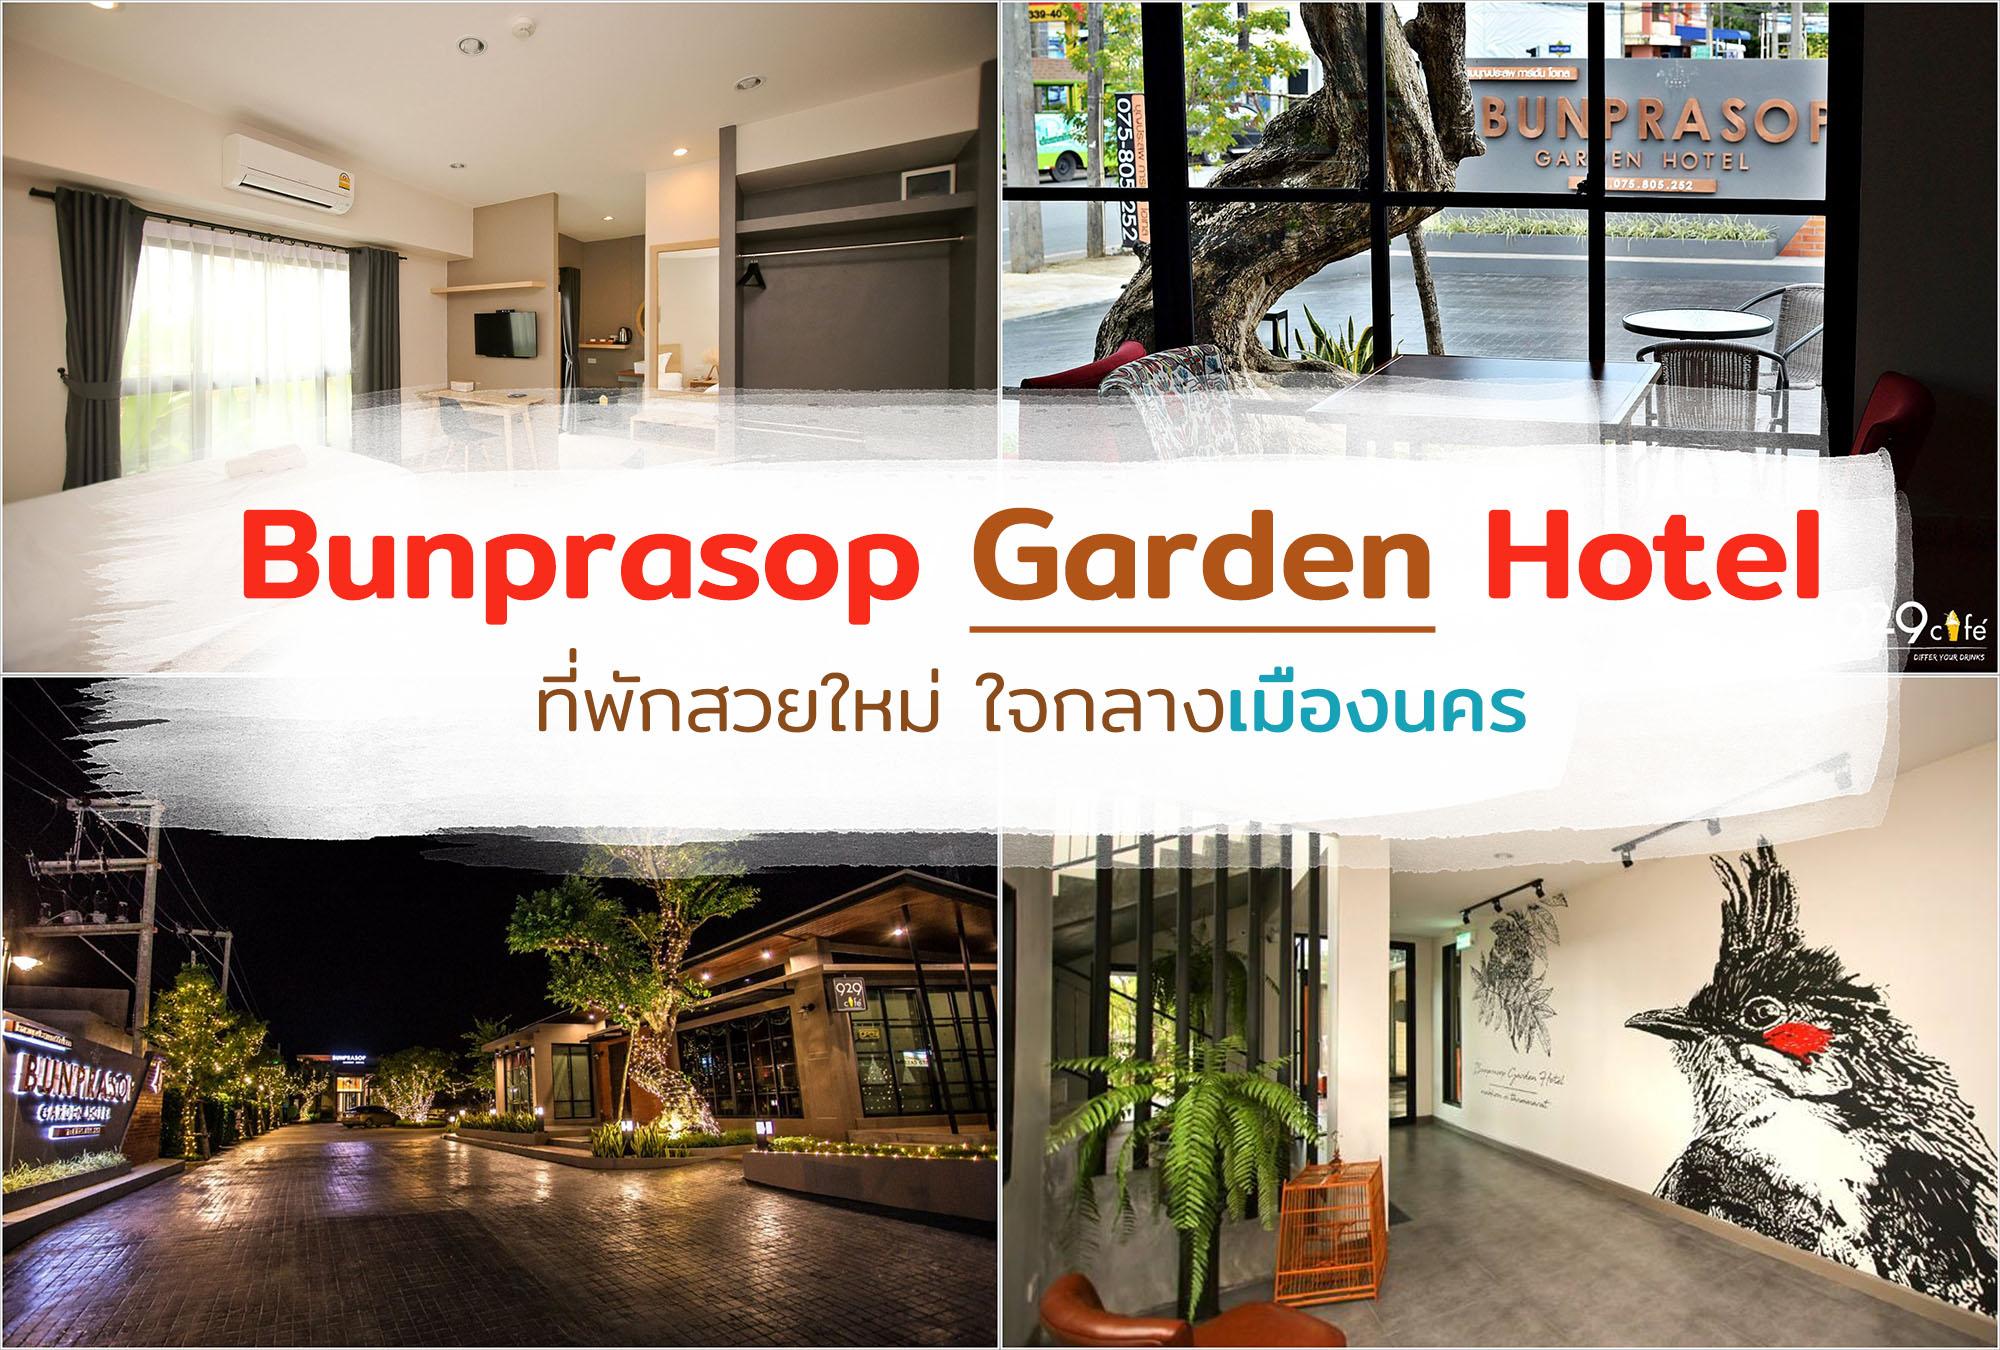 Bunprasop Garden Hotel ที่พักสวยใหม่ ใจกลางเมืองนคร